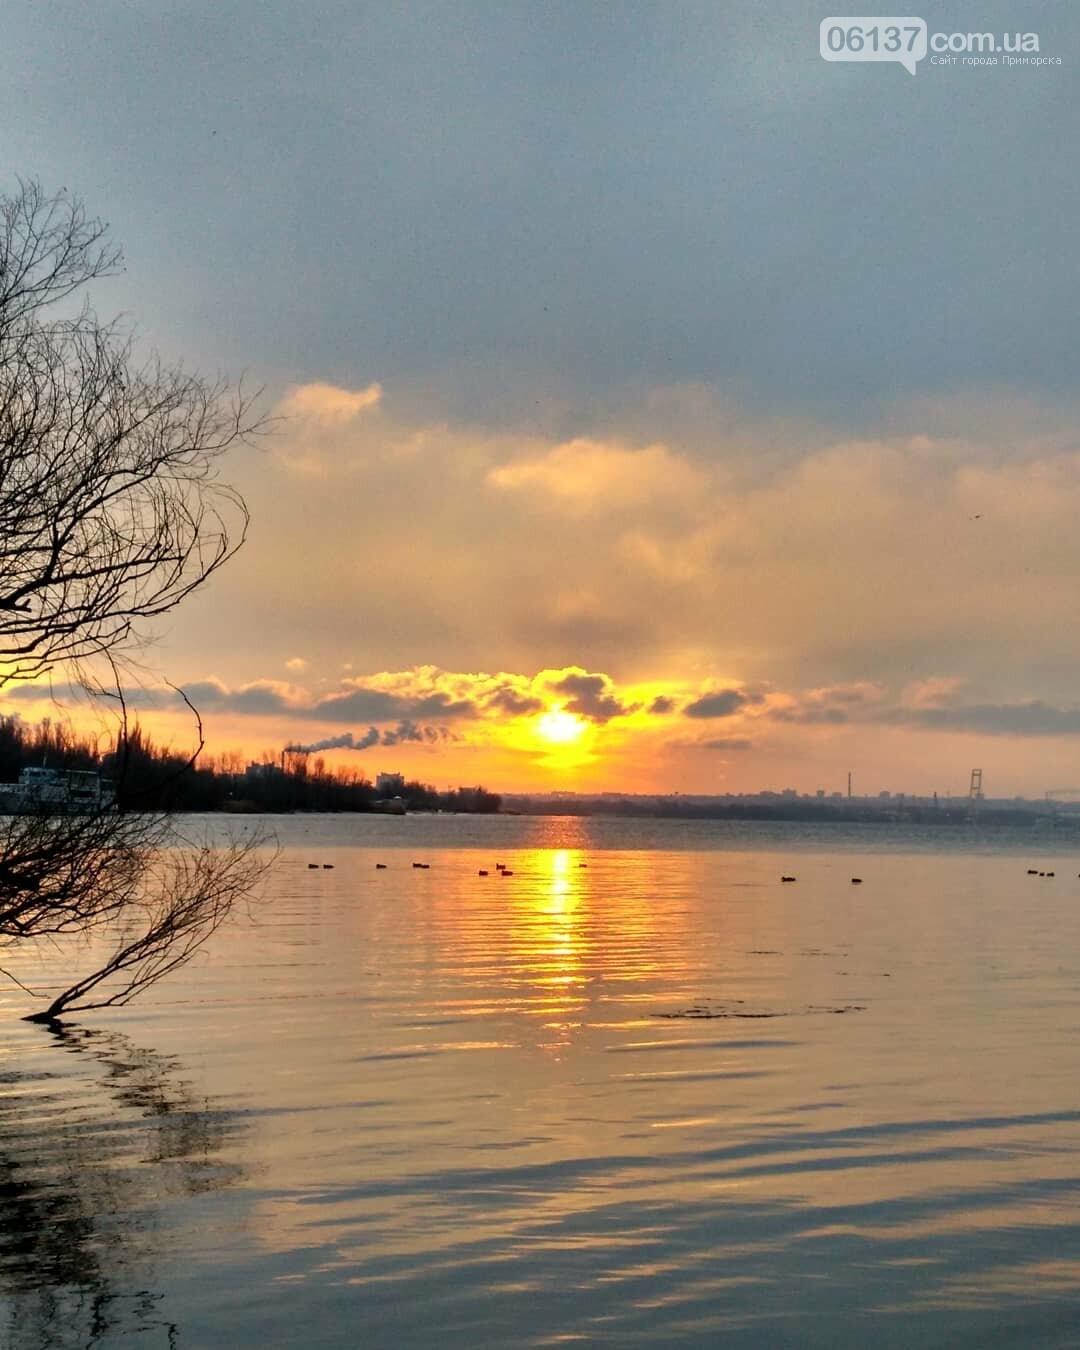 Солнце и лед: рассвет и закат на выходных в Запорожье. Фото  , фото-16